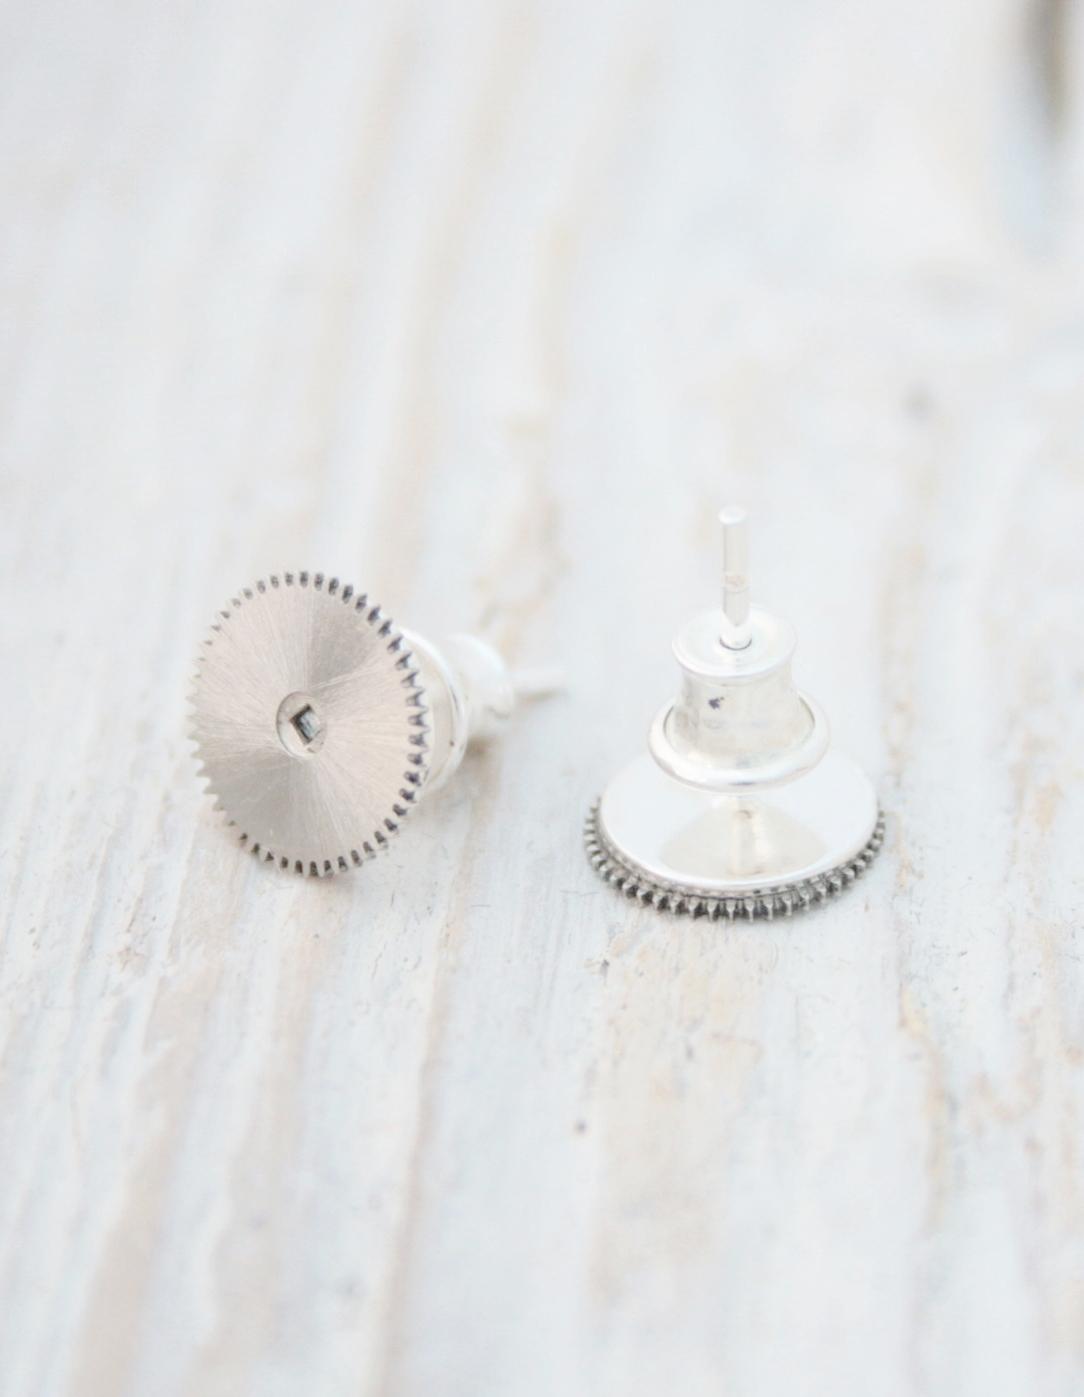 mens studs / steampunk post earrings